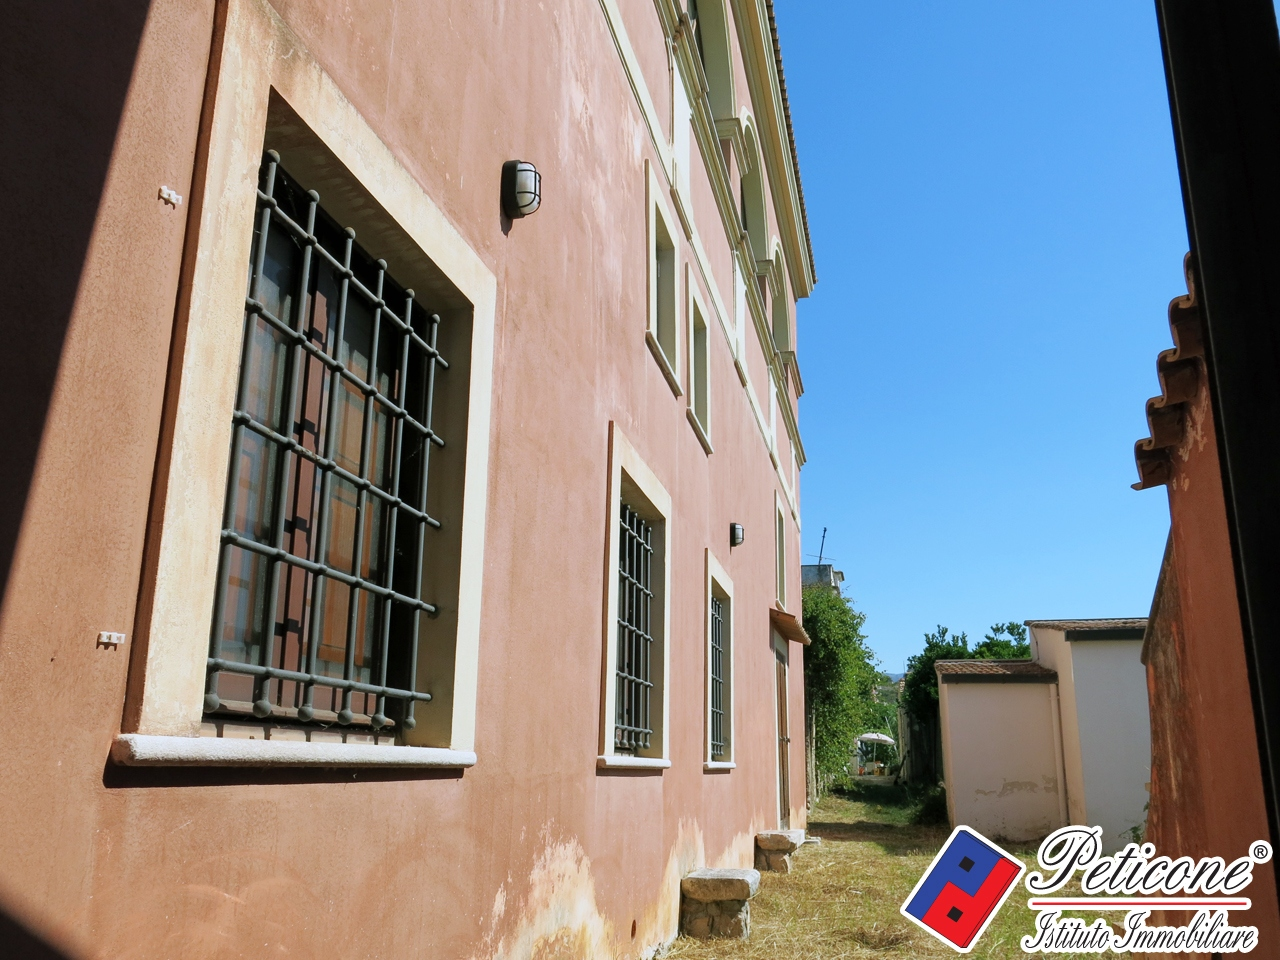 Villa in Vendita a Gaeta: 5 locali, 250 mq - Foto 20